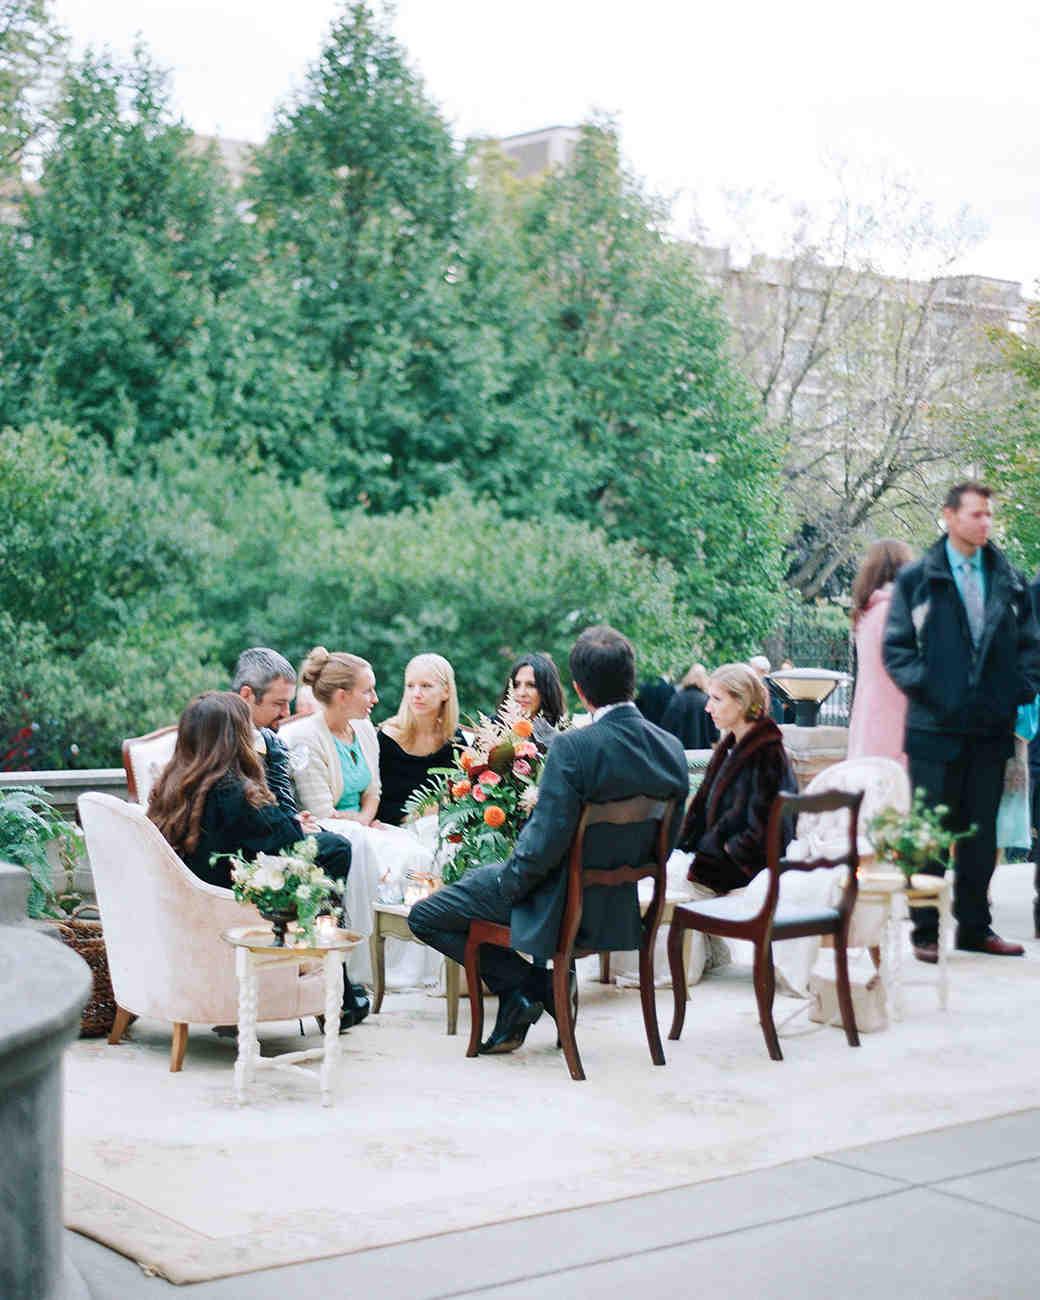 adrienne-jason-wedding-minnesota-cocktail-hour-guests-0201-s111925.jpg